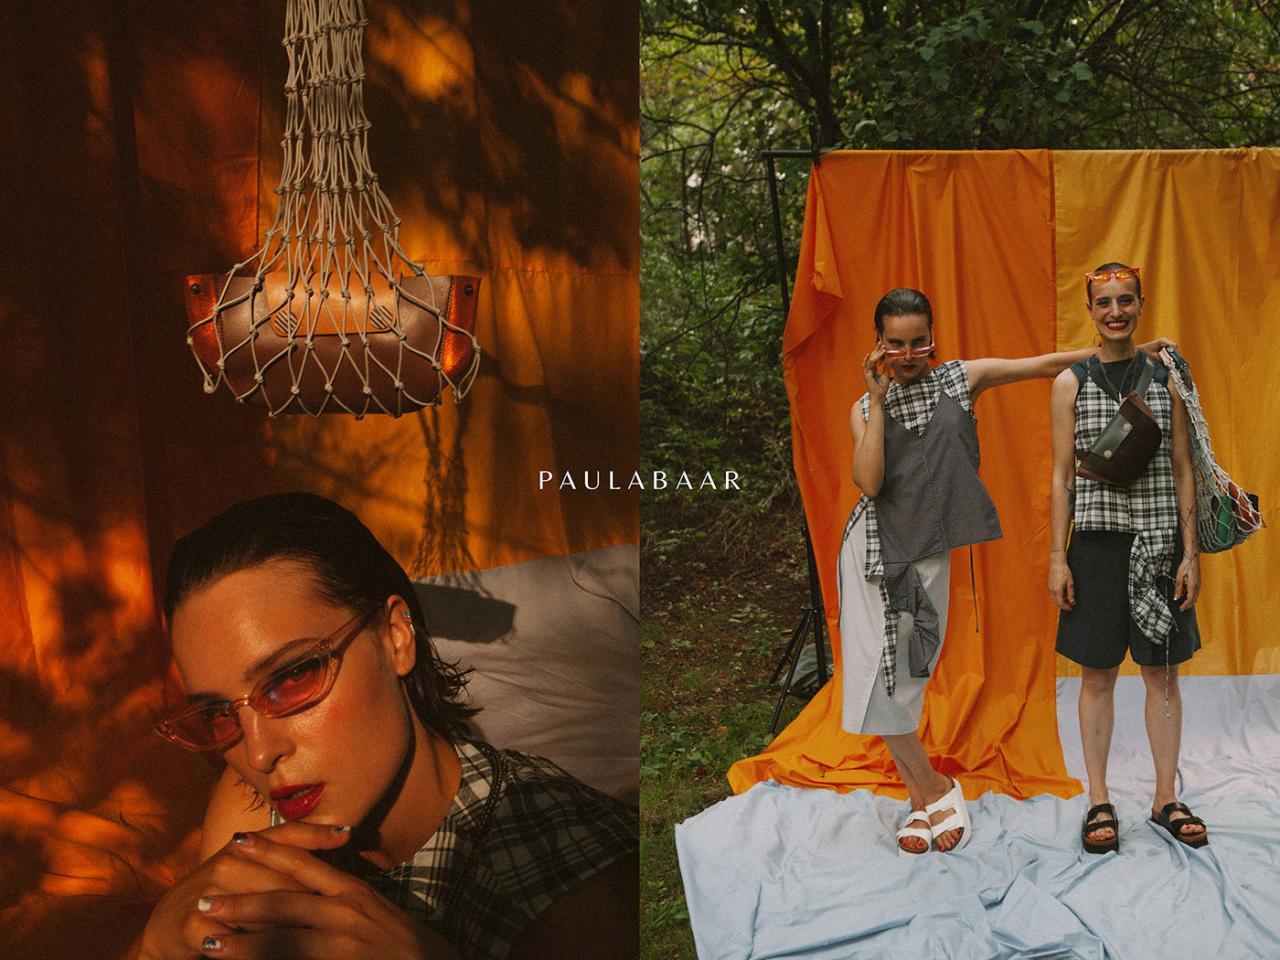 Kamil Kotarba摄影作品PAULABAAR campaign SS 2018/19 时尚图库 第1张